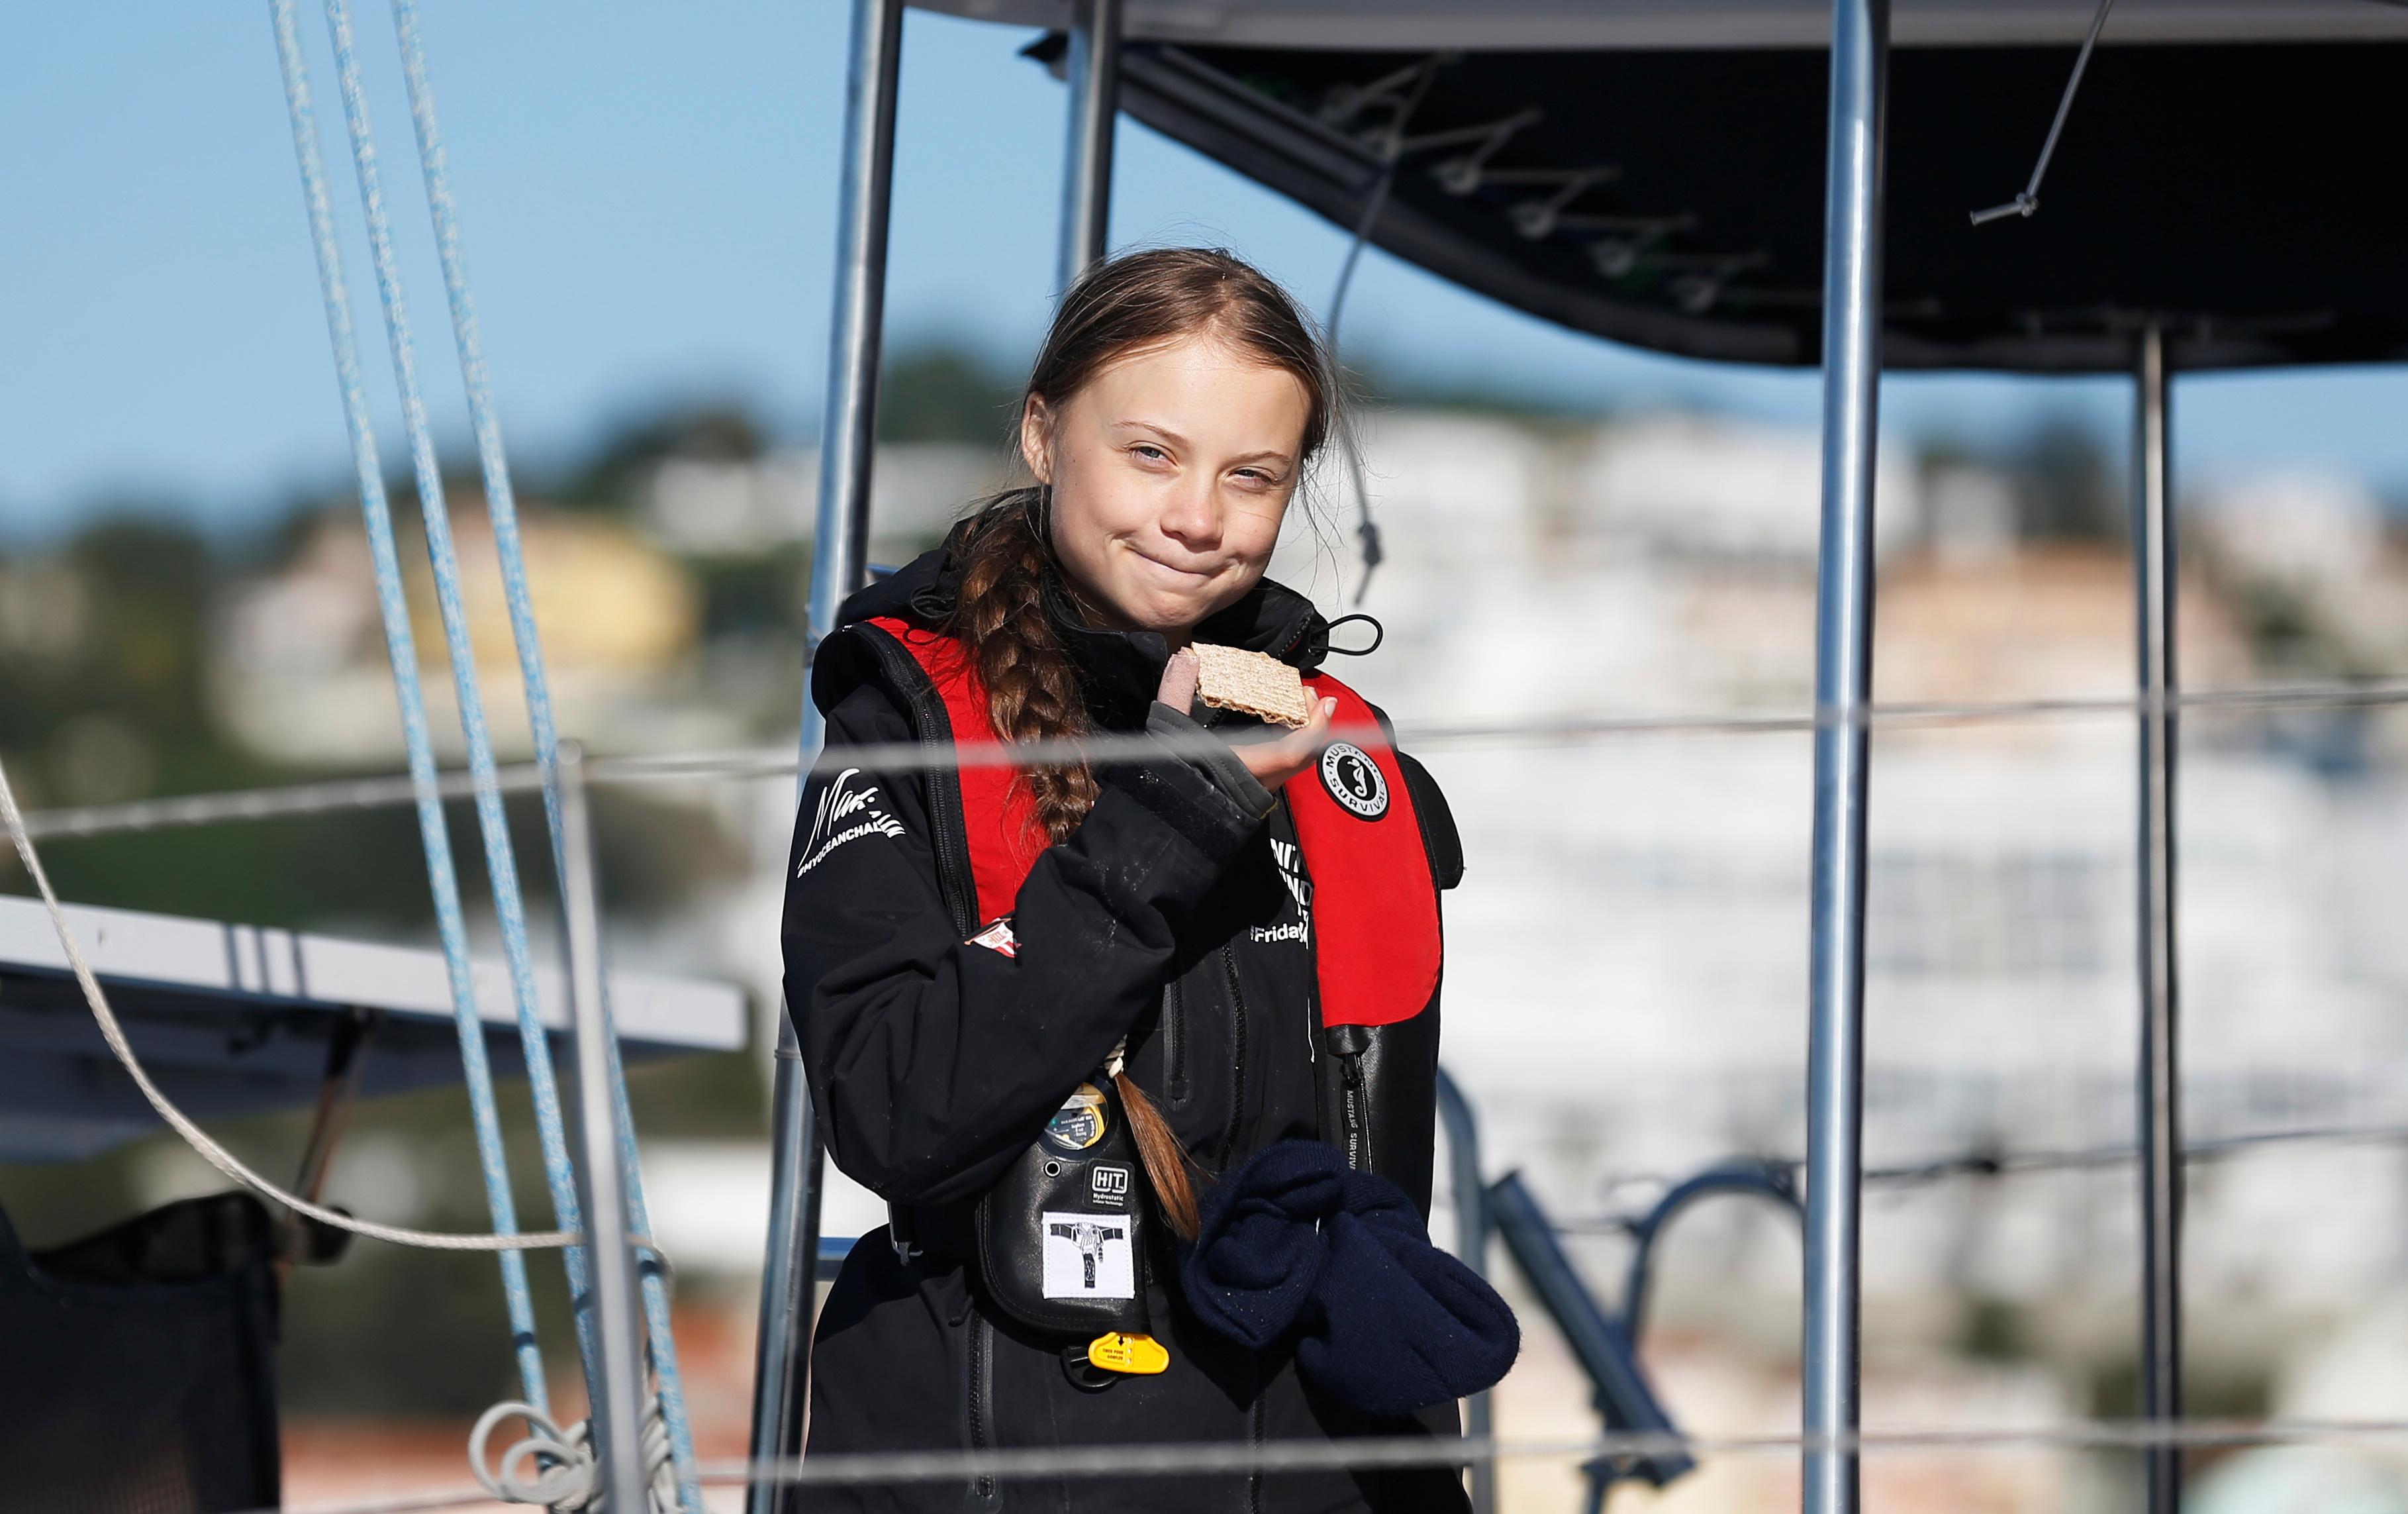 Climate change activist Greta Thunberg arrives aboard the yacht La Vagabonde at Santo Amaro port in Lisbon, Portugal December 3, 2019. REUTERS/Rafael Marchante - RC2NND96P05W